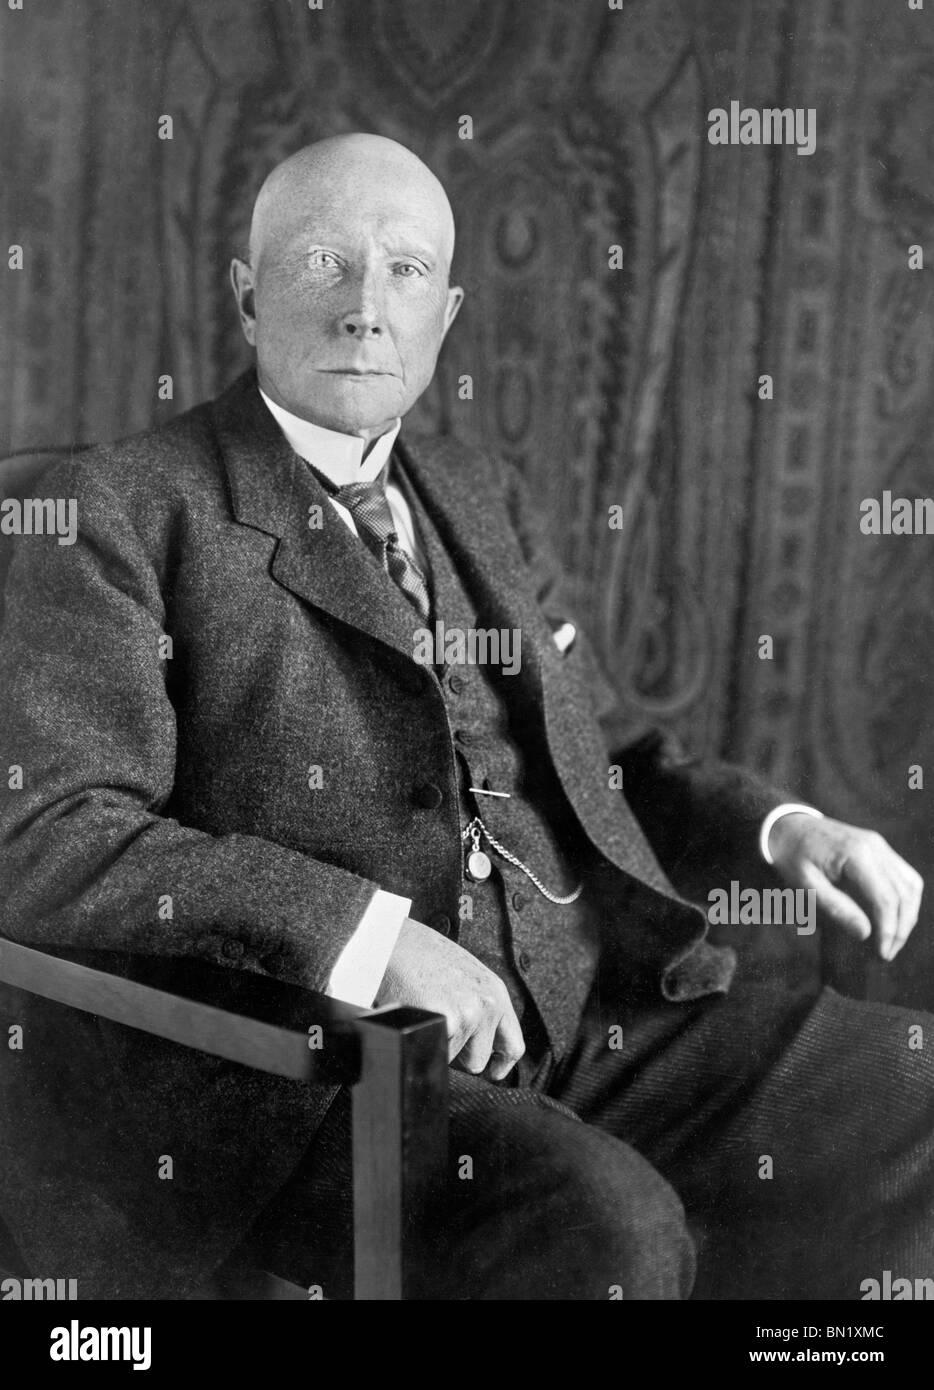 Portrait photo circa 1909 of billionaire American industrialist John Davison Rockefeller (1839 - 1937). - Stock Image